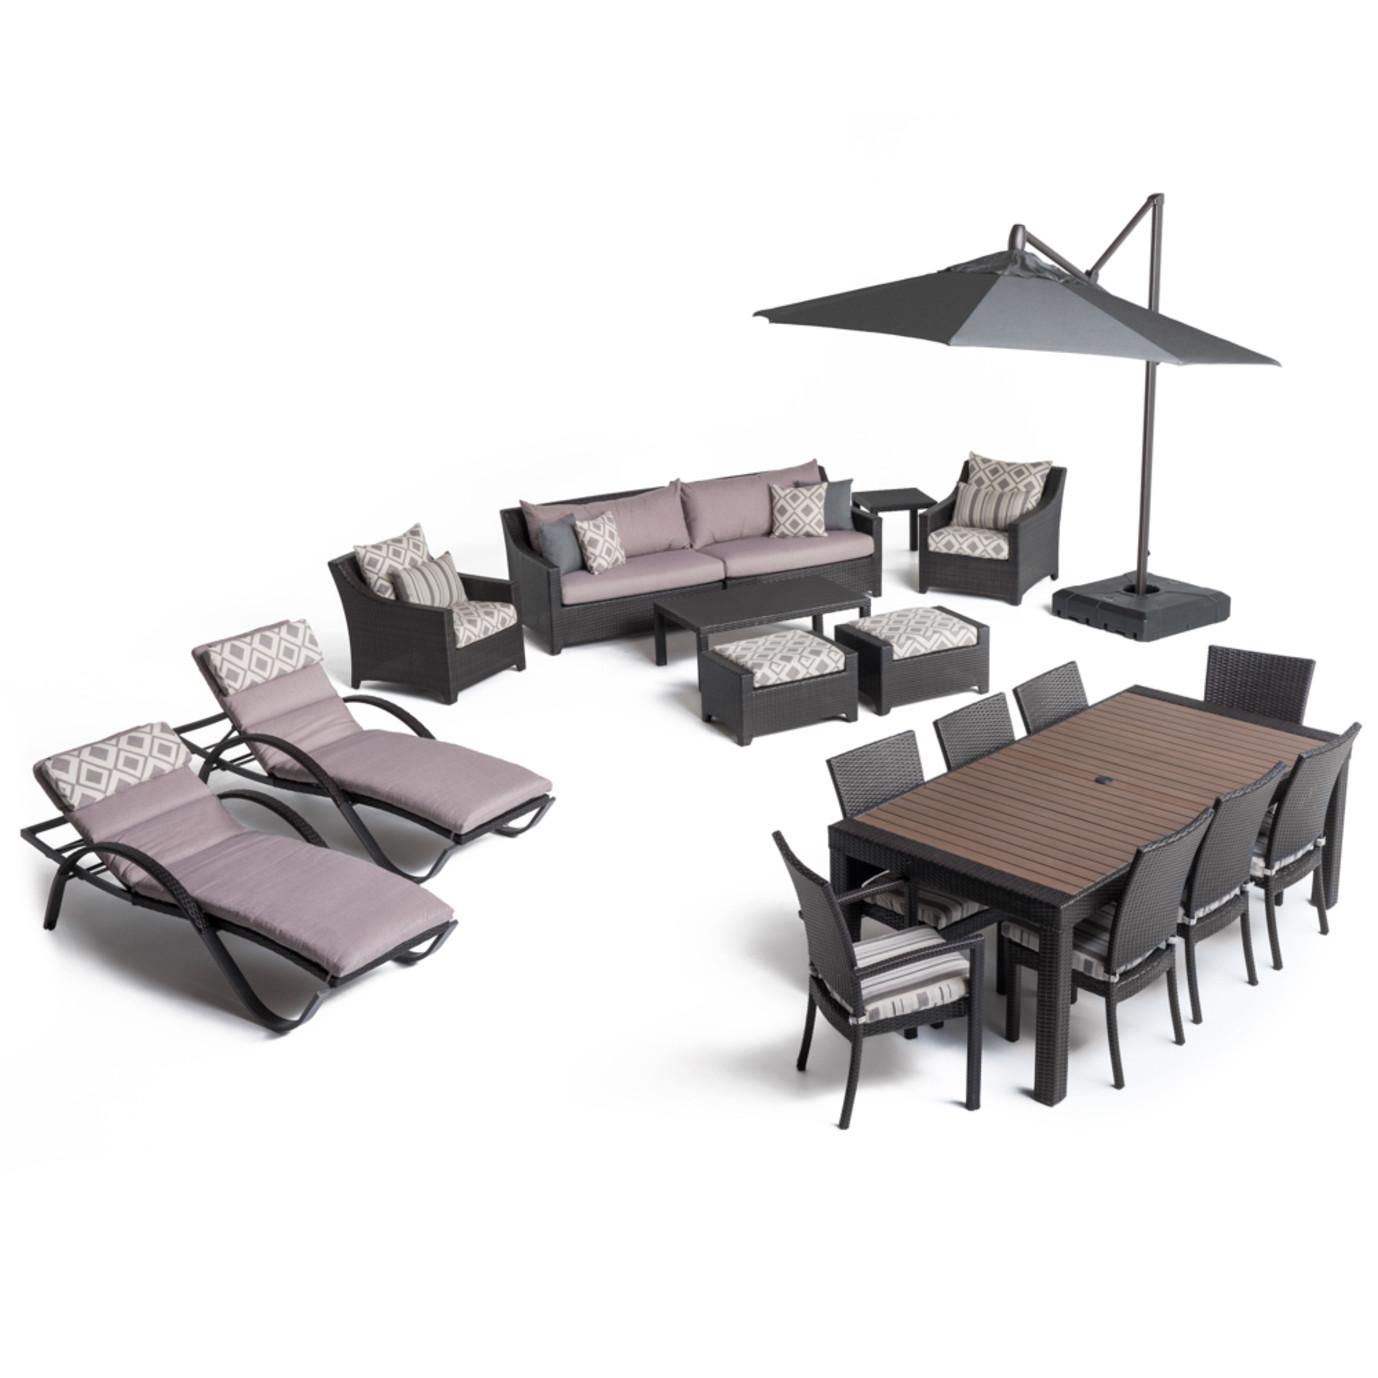 Deco™ 20pc Outdoor Estate Set - Wisteria Lavender